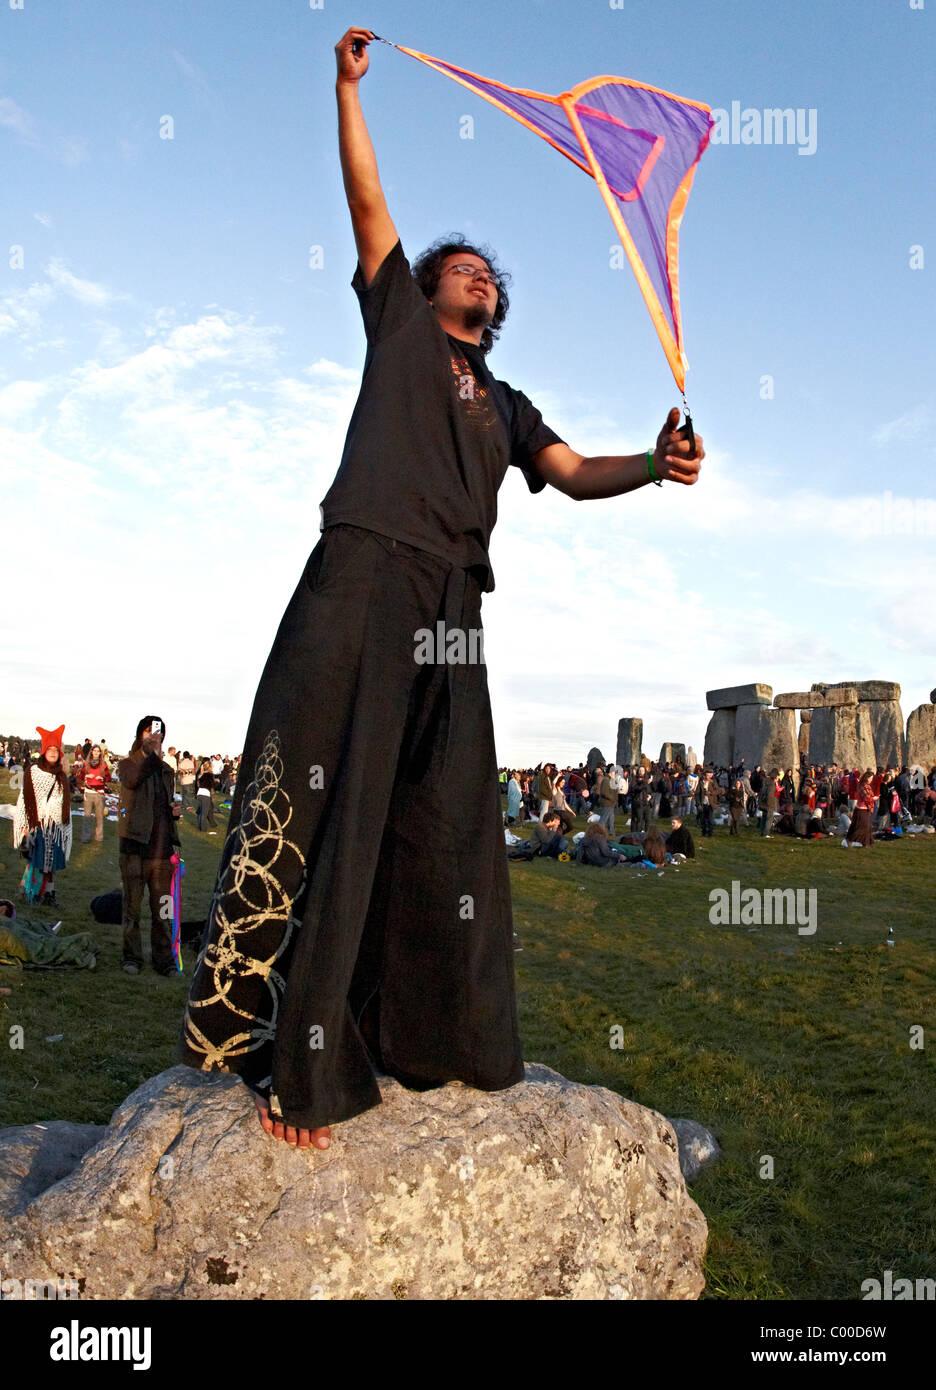 Festival Goer With Flag At The Summer Solstice Stonehenge UK Europe - Stock Image